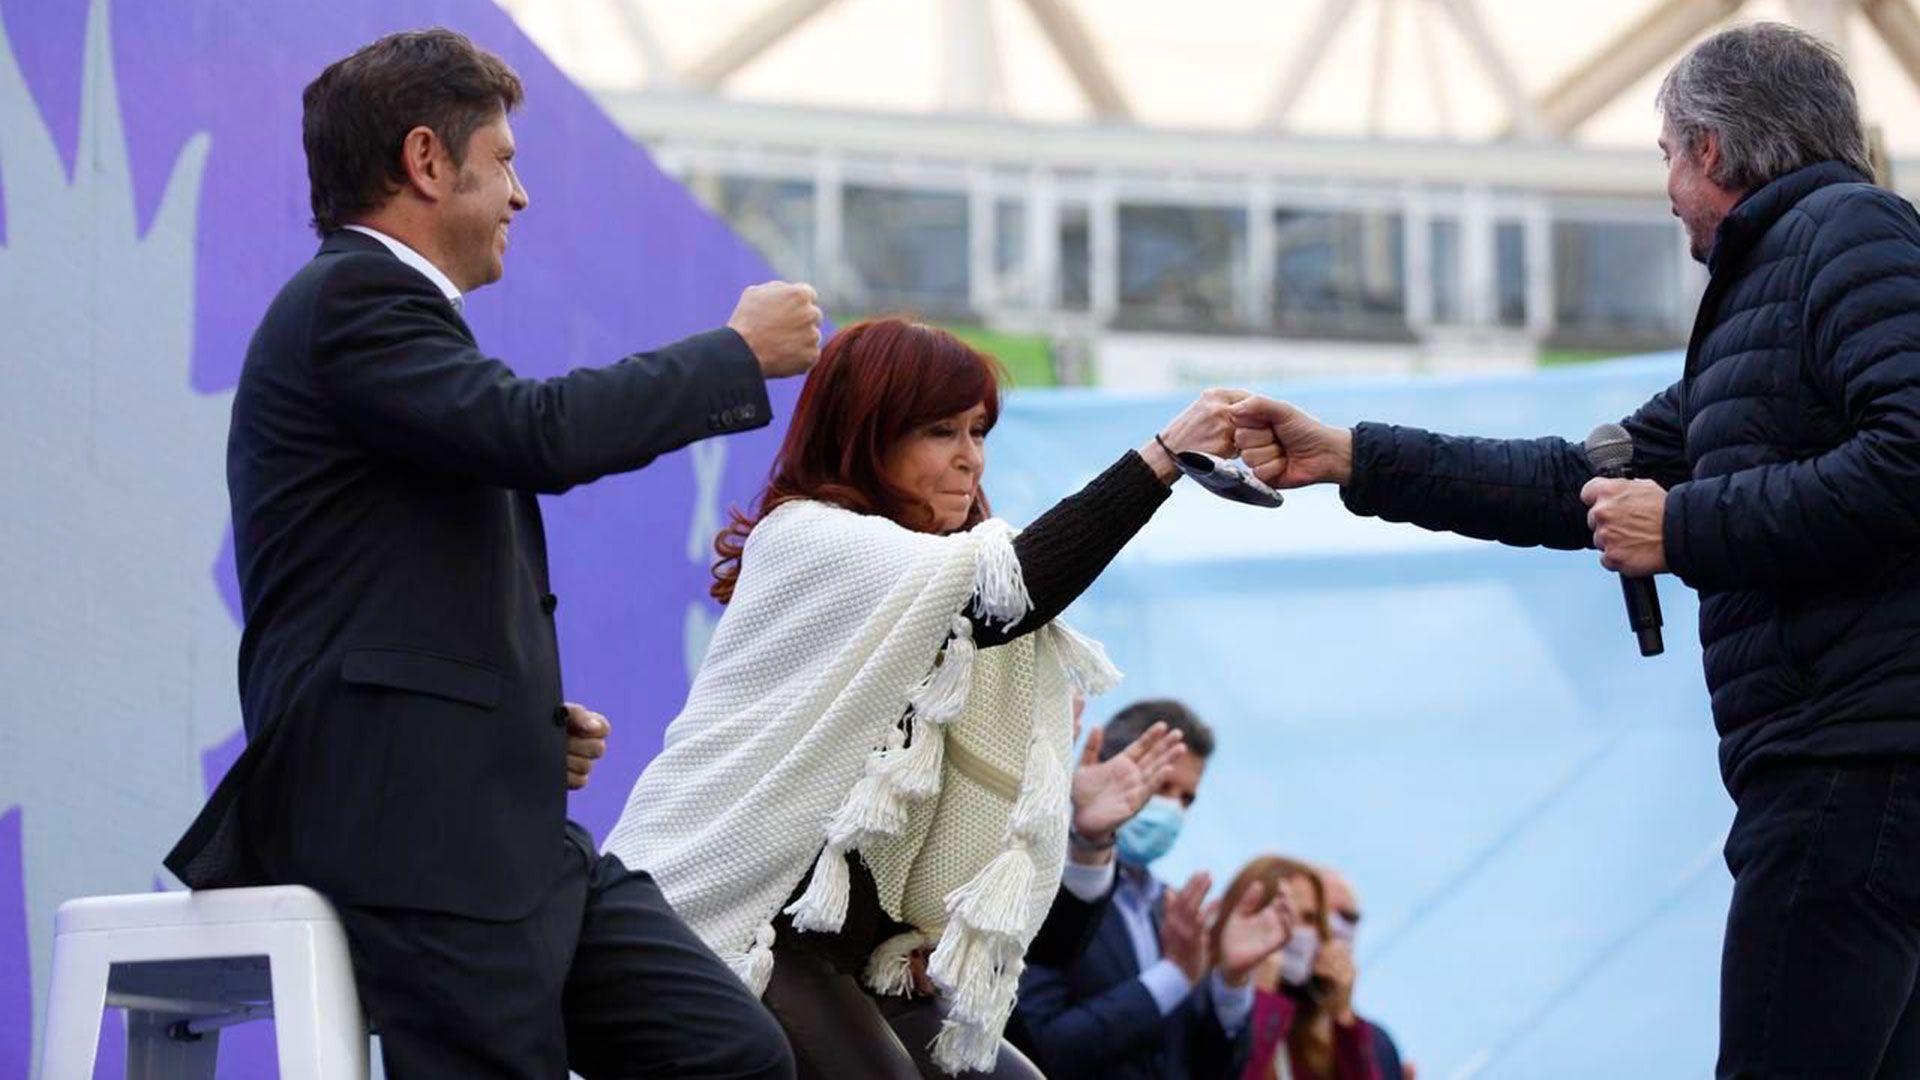 Axel Kicillof - Cristina Fernández de Kirchner - Máximo Kirchner - Alberto Fernández